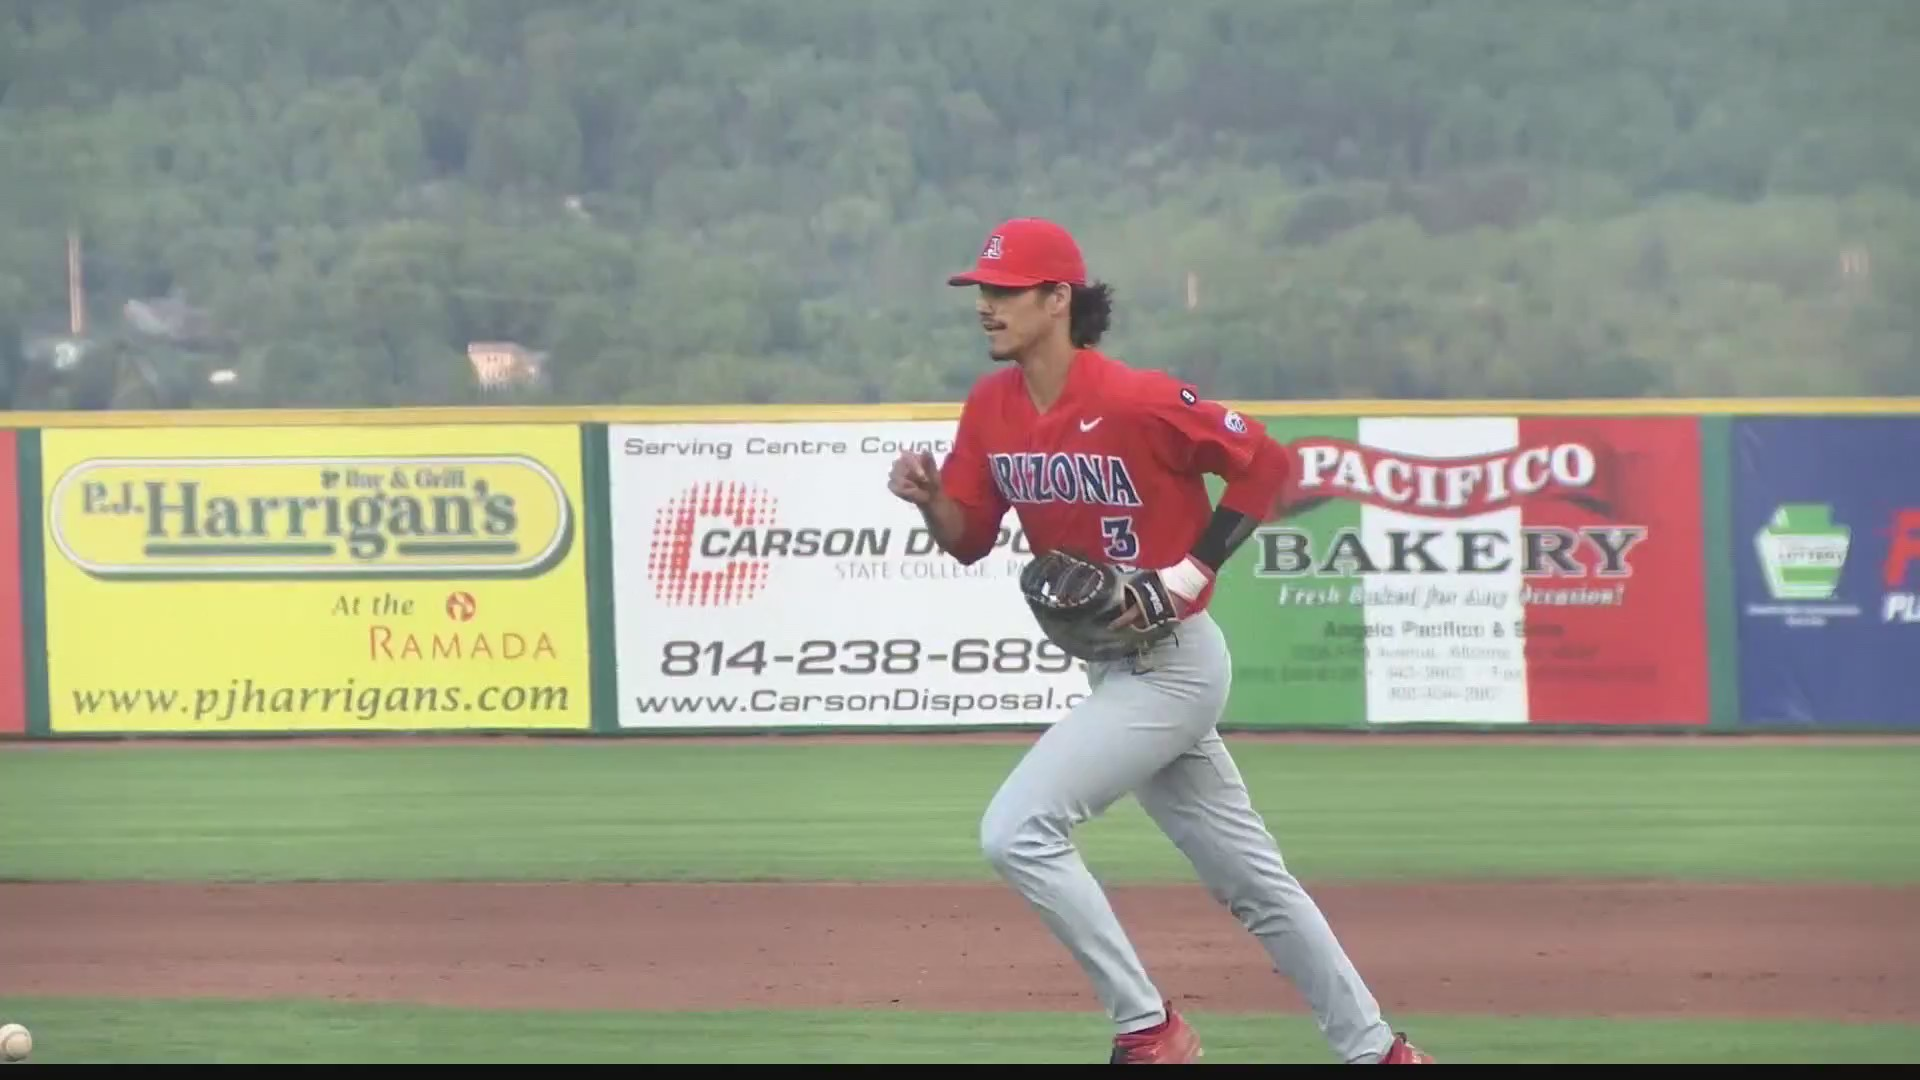 Penn_State_baseball_drops_opening_game_o_0_20190517033312